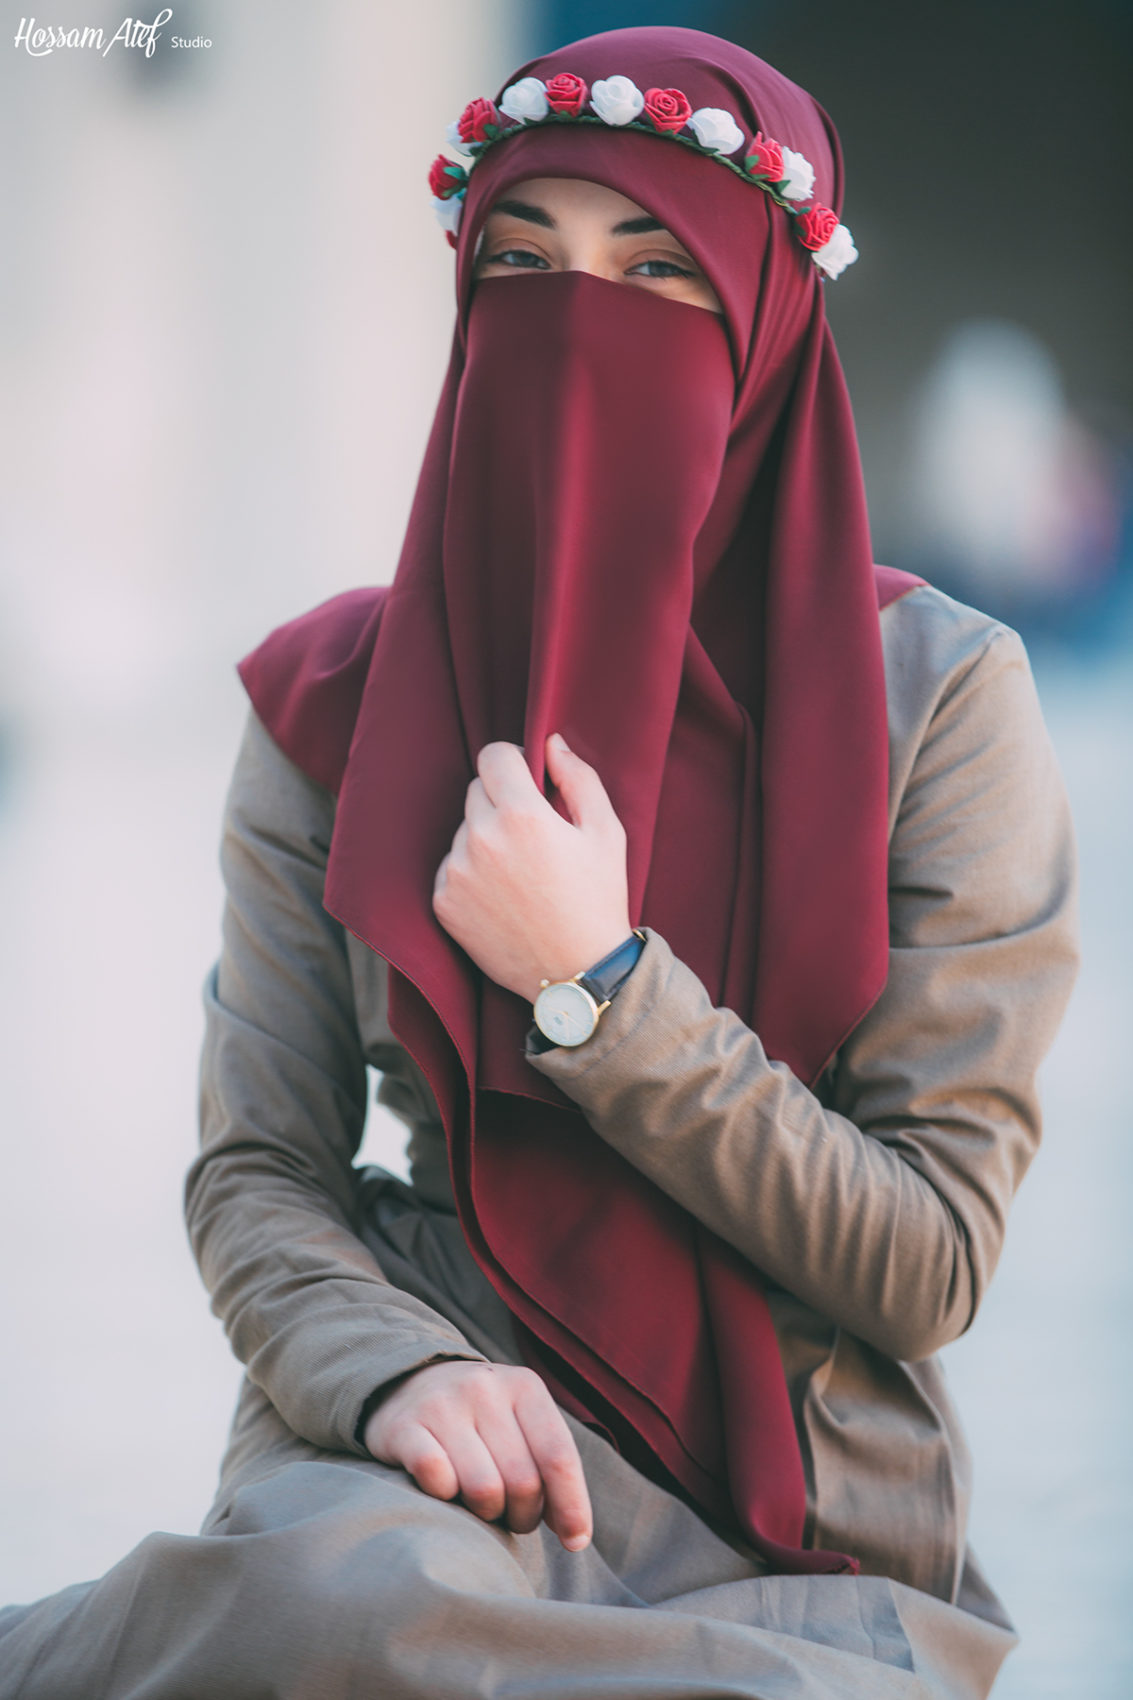 Beautiful Photoshoot Muslim Girl in Niqab | 99inspiration